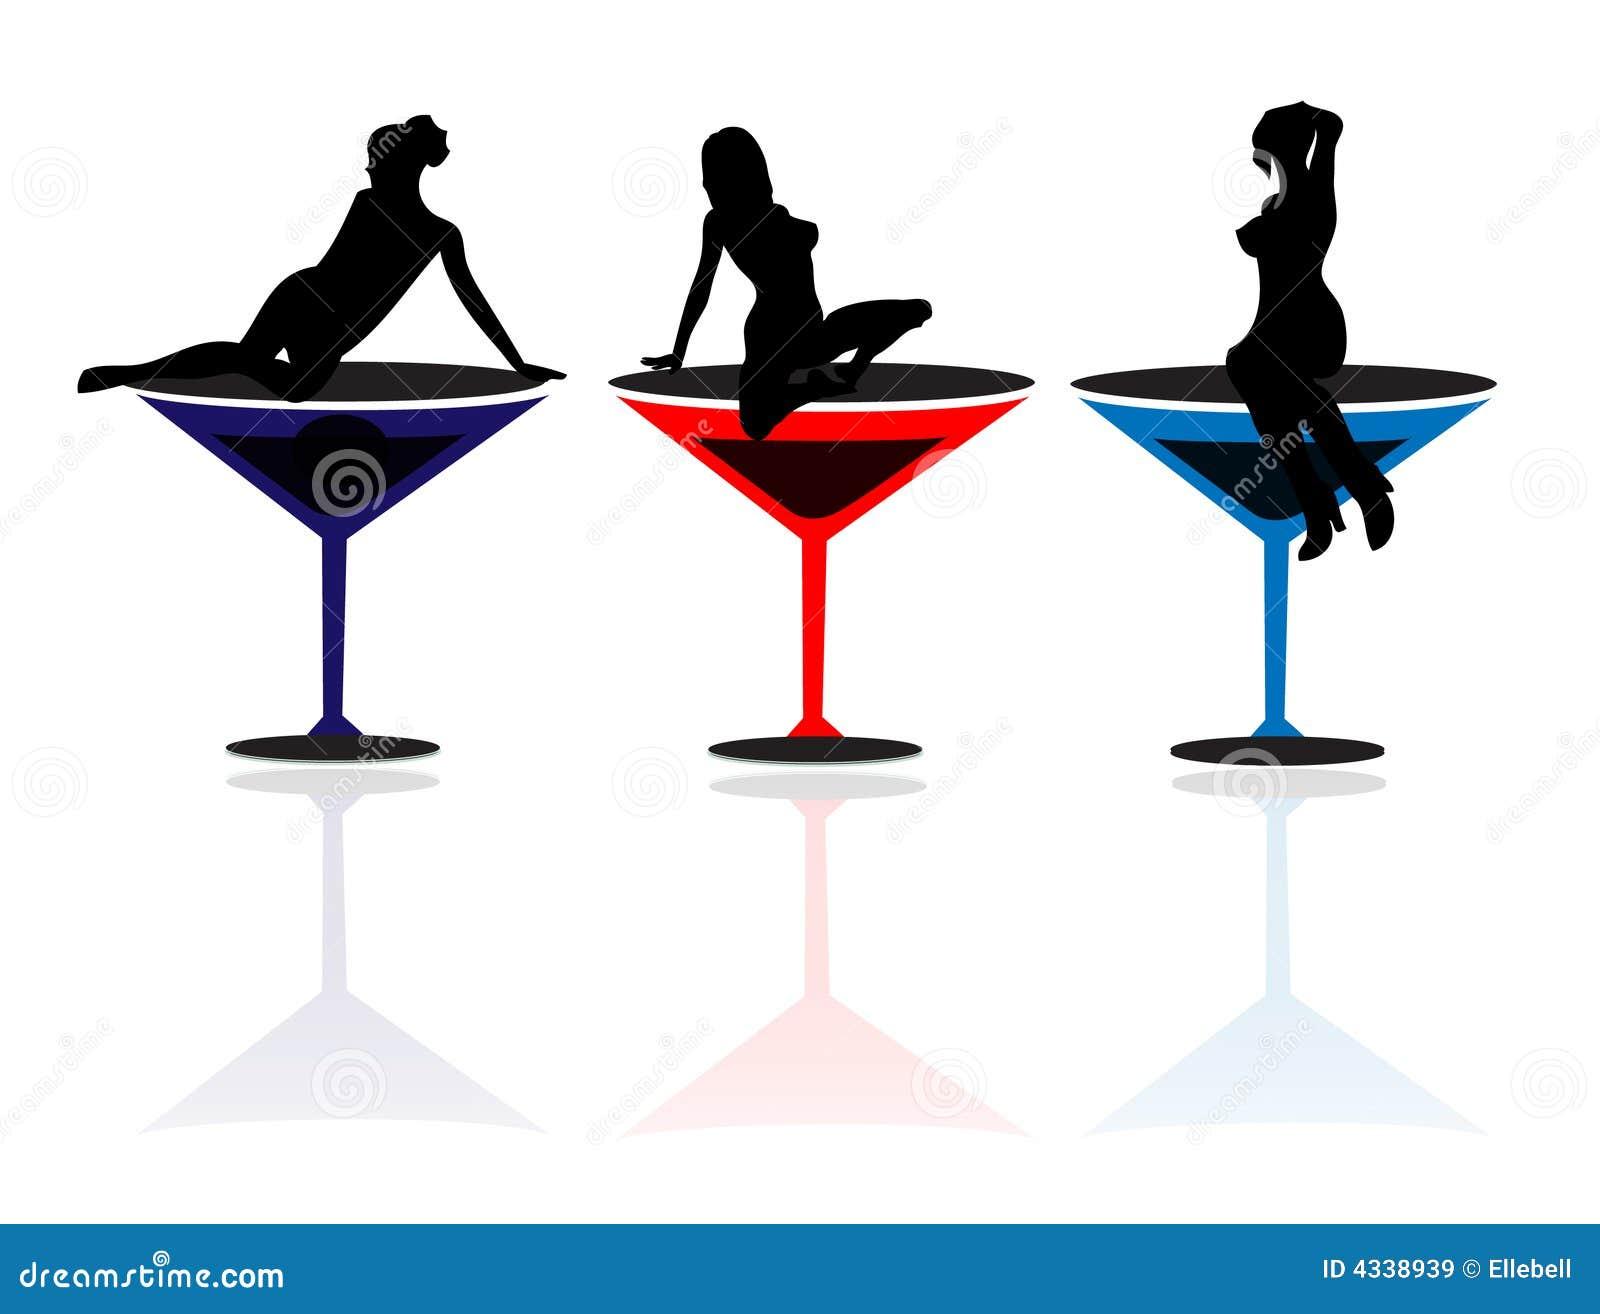 girls and martini glasses stock illustration illustration of three rh dreamstime com Lady in Martini Glass Clip Art Two Martini Glass Clip Art